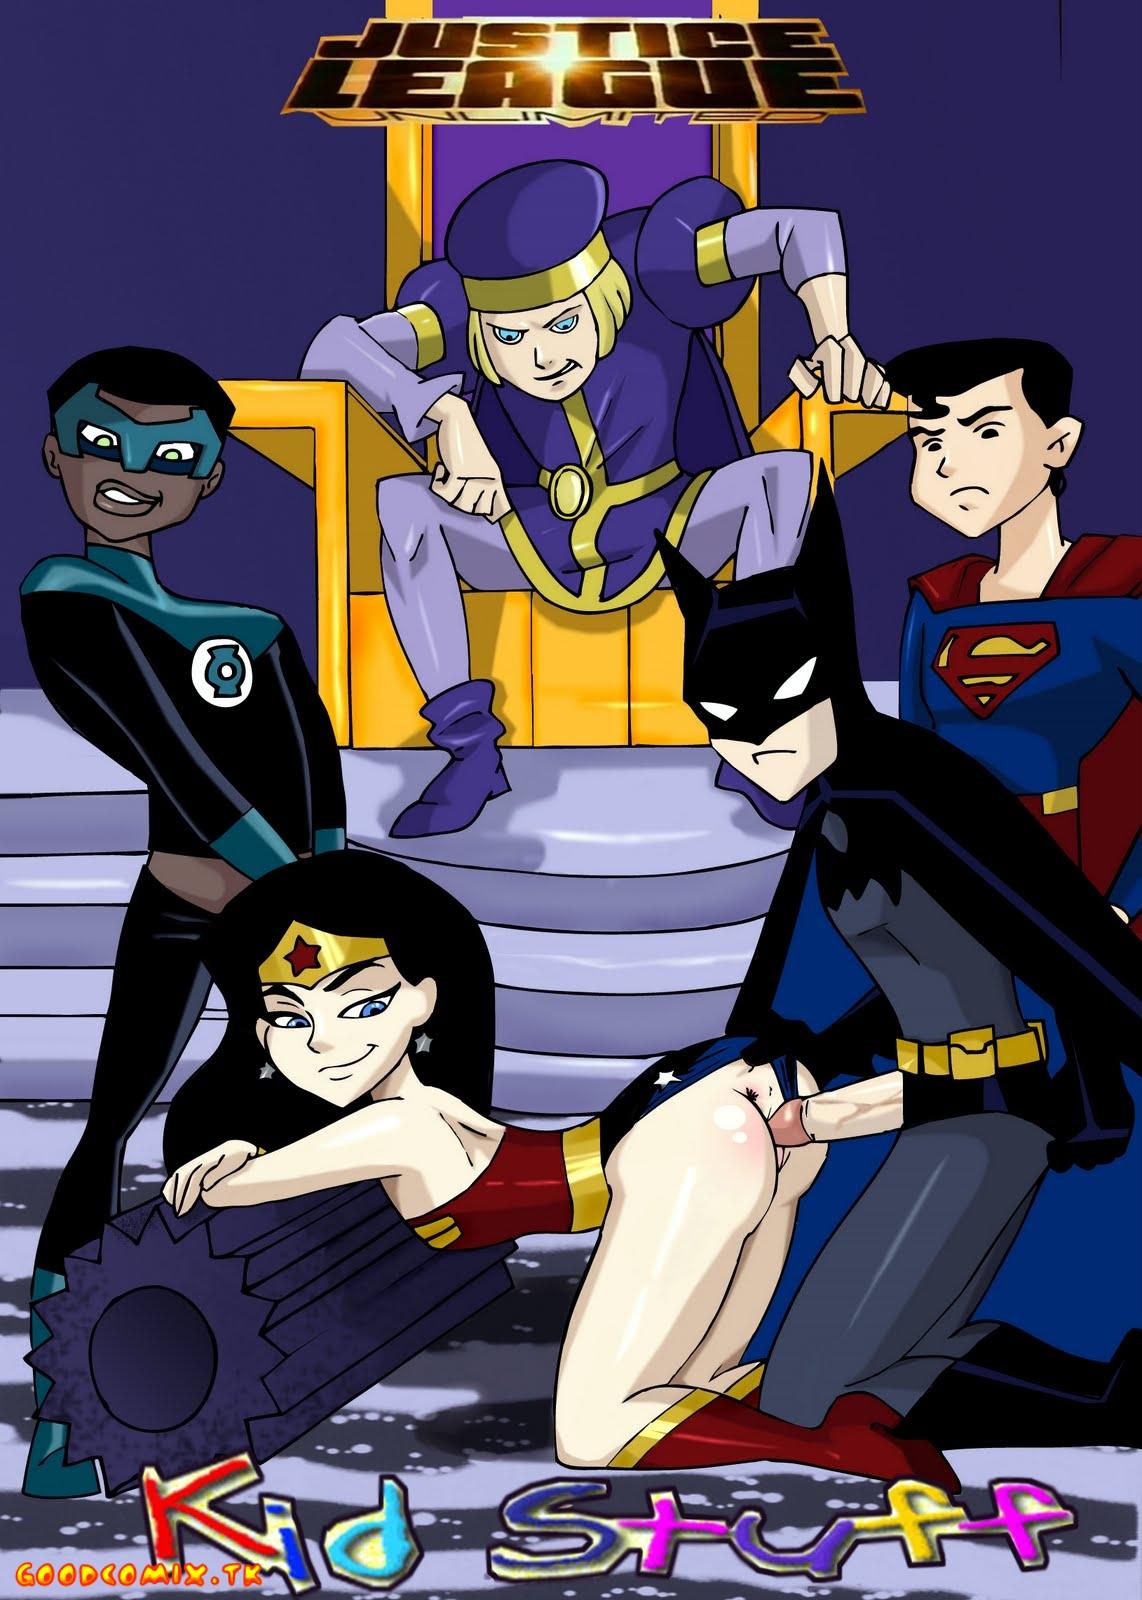 Goodcomix.tk Justice League - [HOTDESIGNS2] - Justice League Unlimited - Kid Stuff